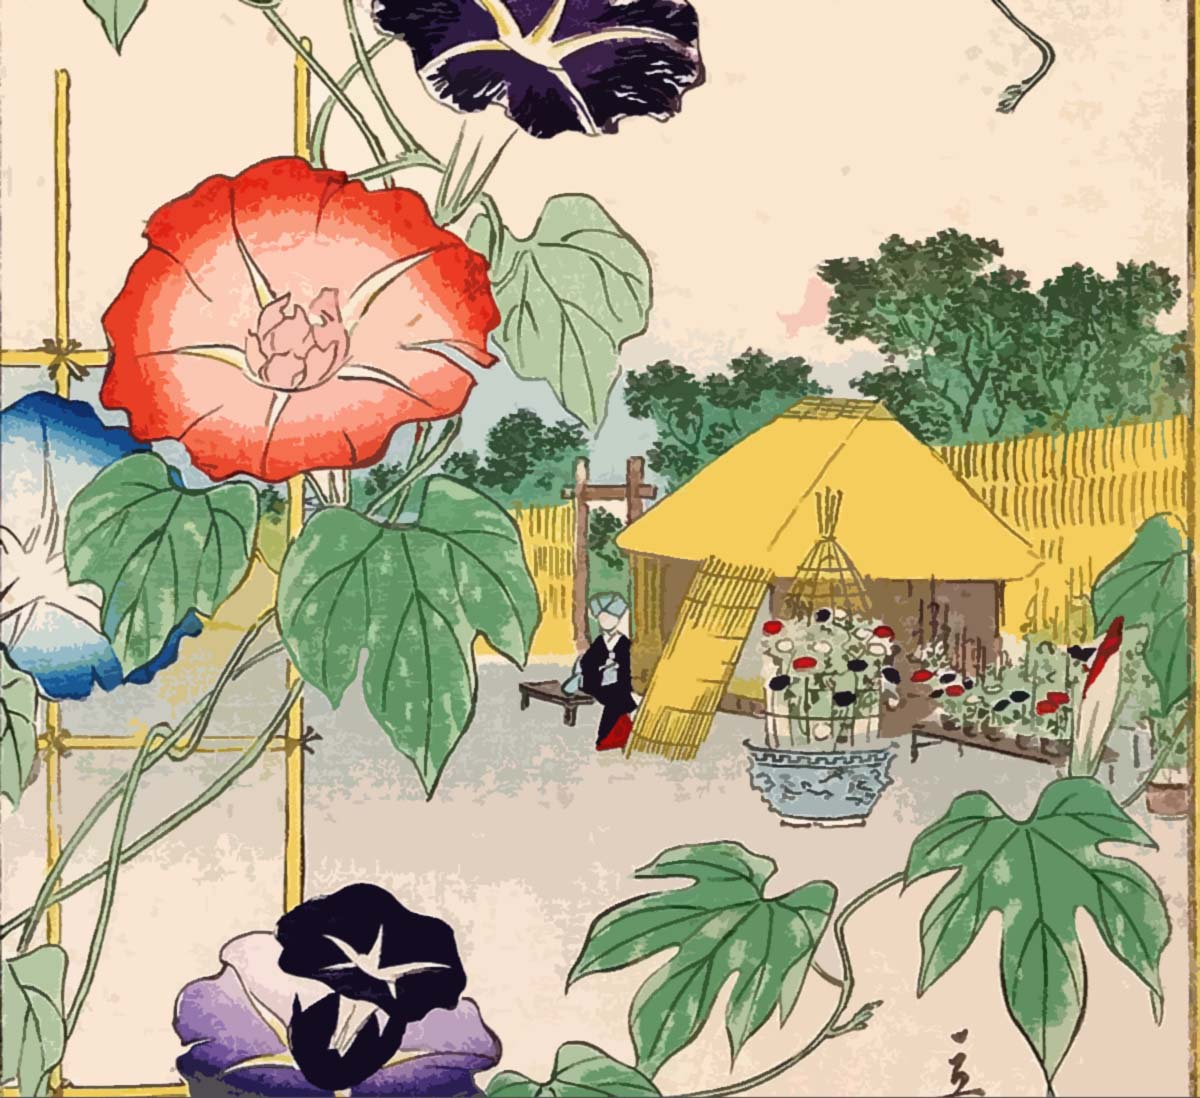 hiroshige, 1866 morning glories